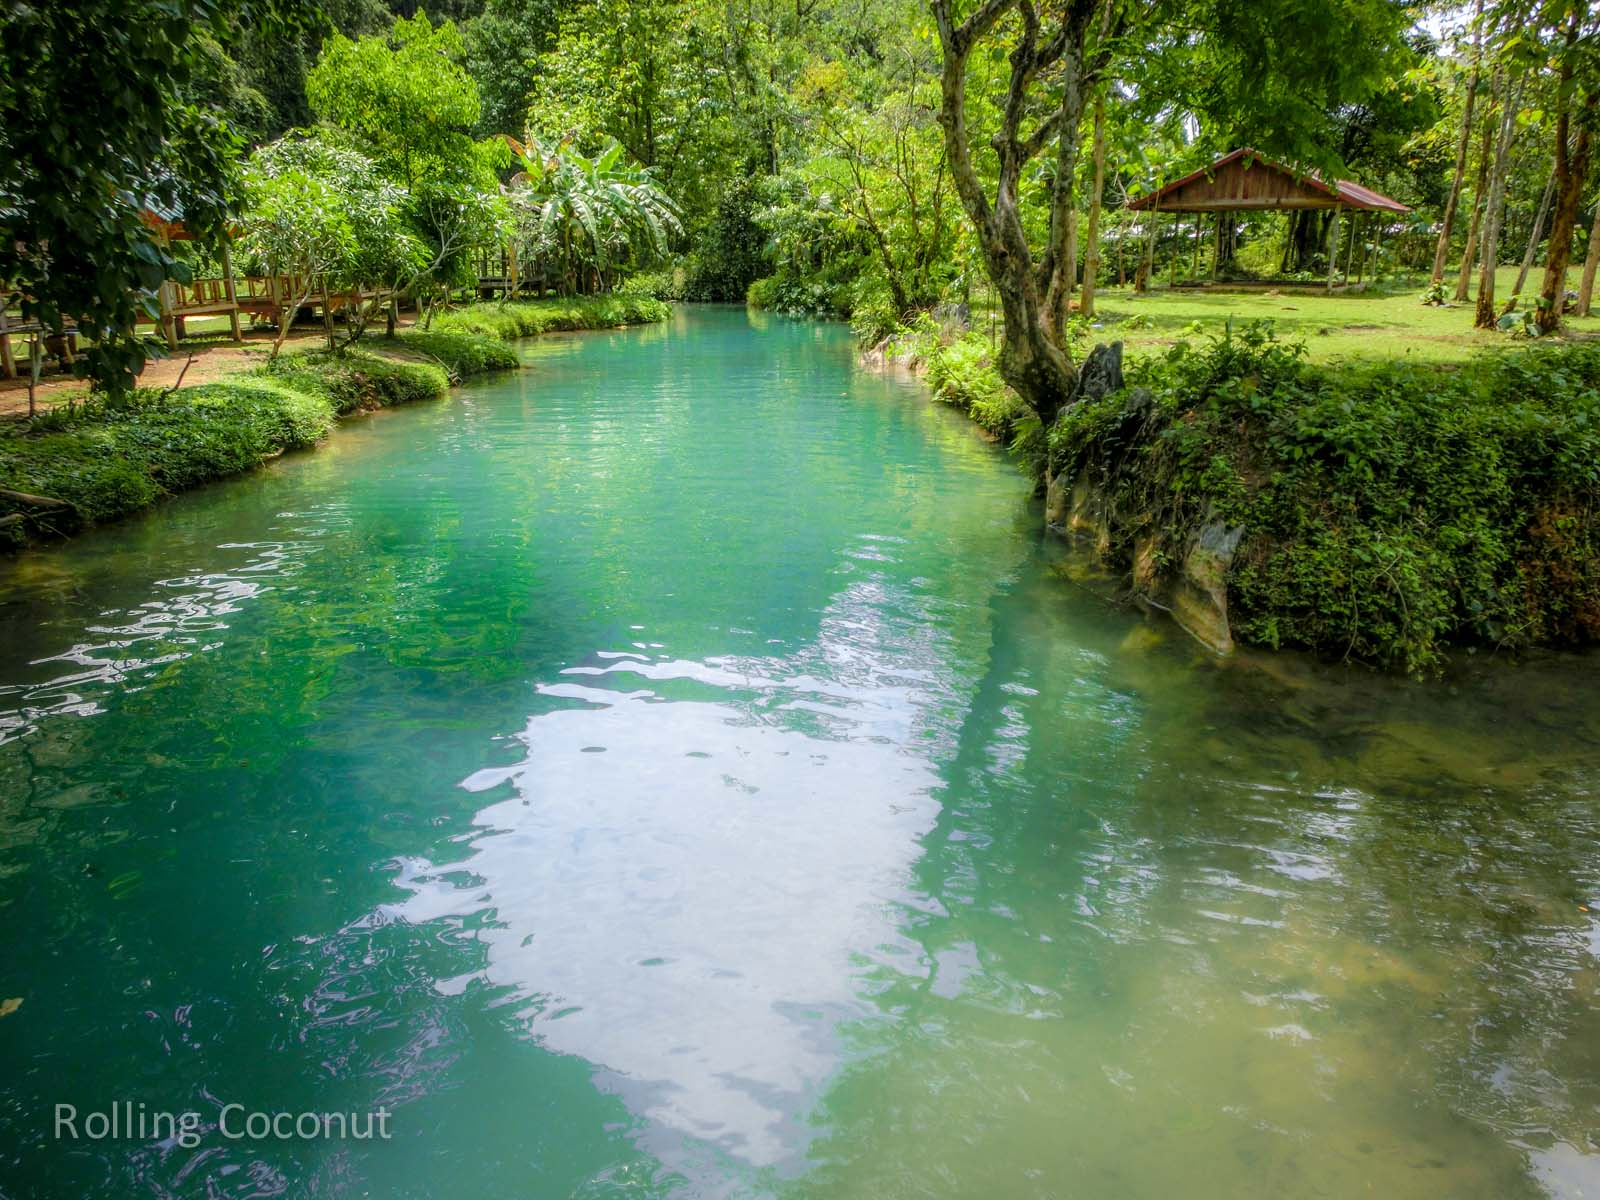 Blue Lagoon Vang Vieng Laos Rolling Coconut Ooaworld Photo Ooaworld